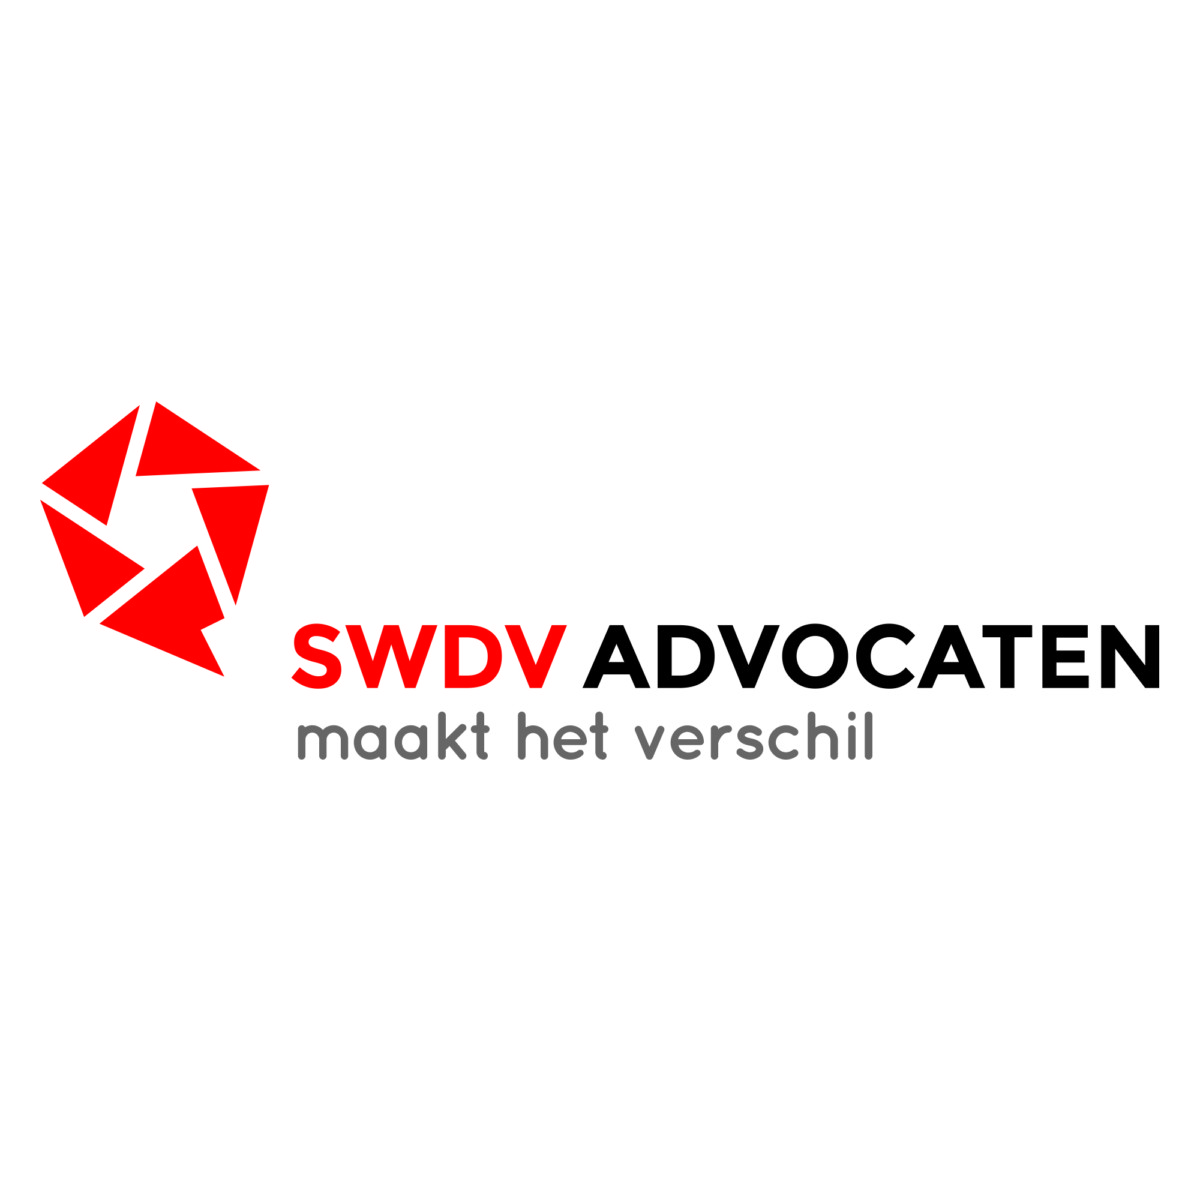 SWDV advocaten